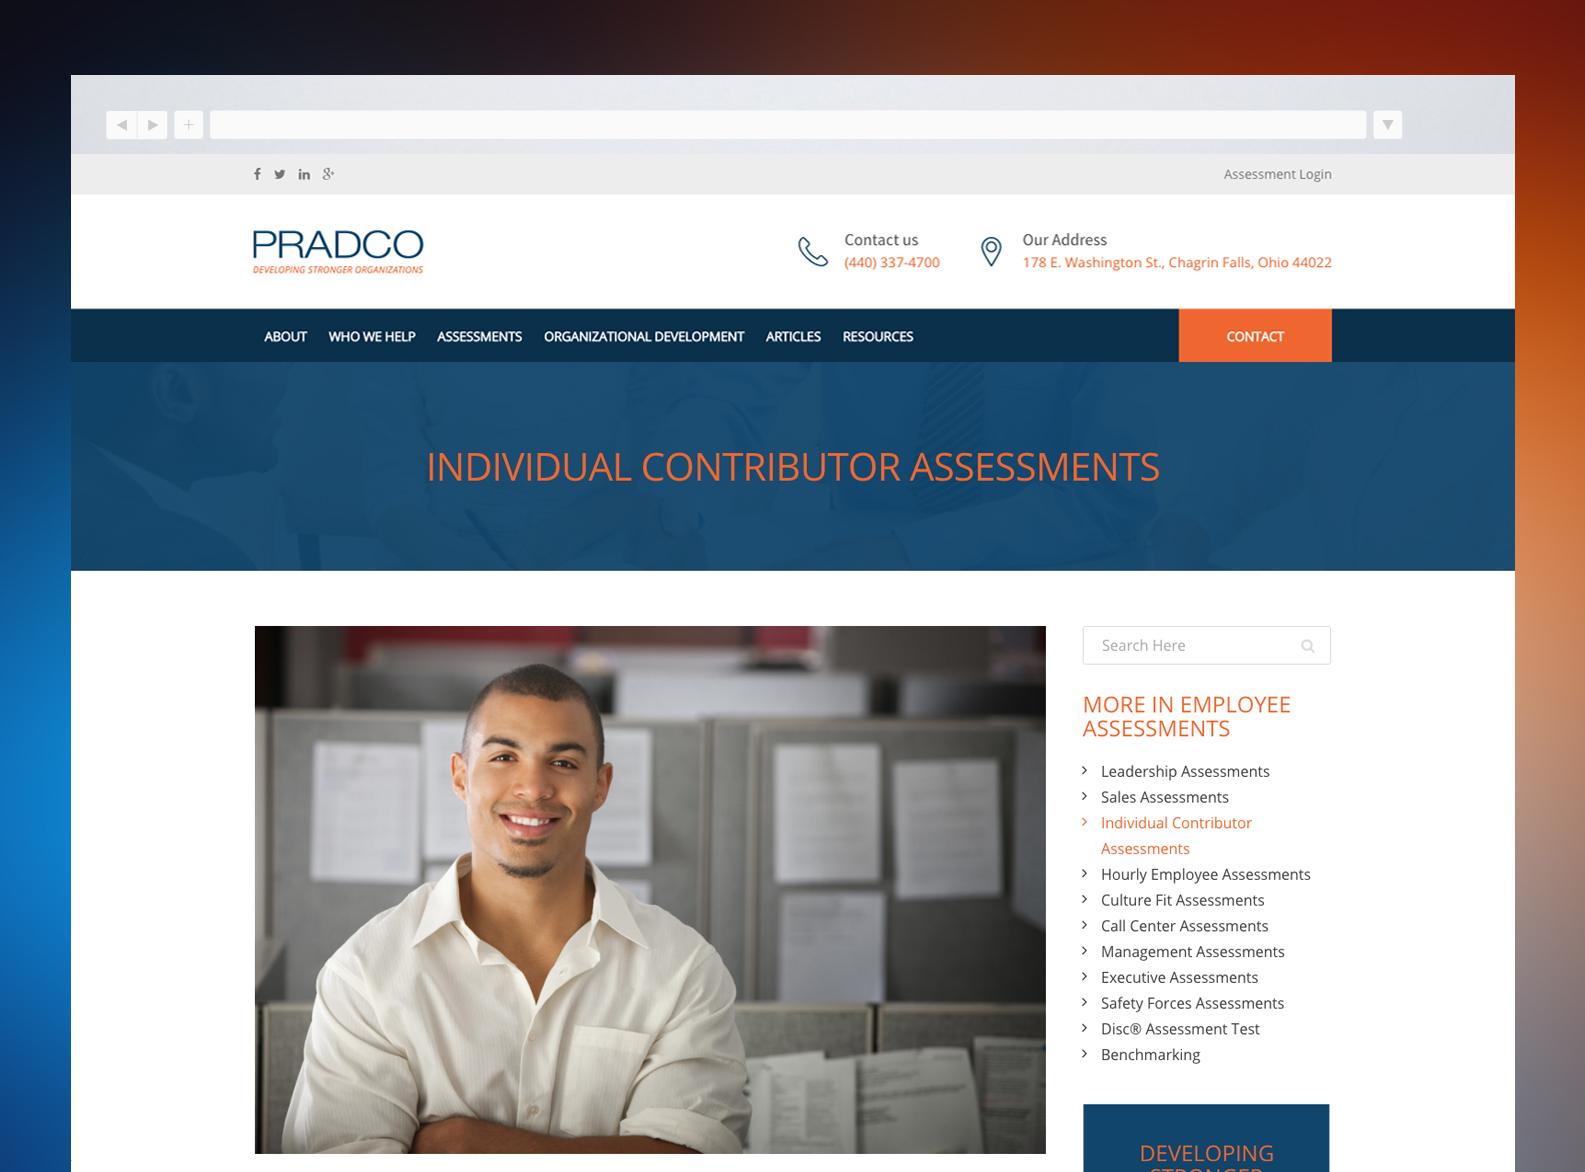 PRADCO Website Coaching